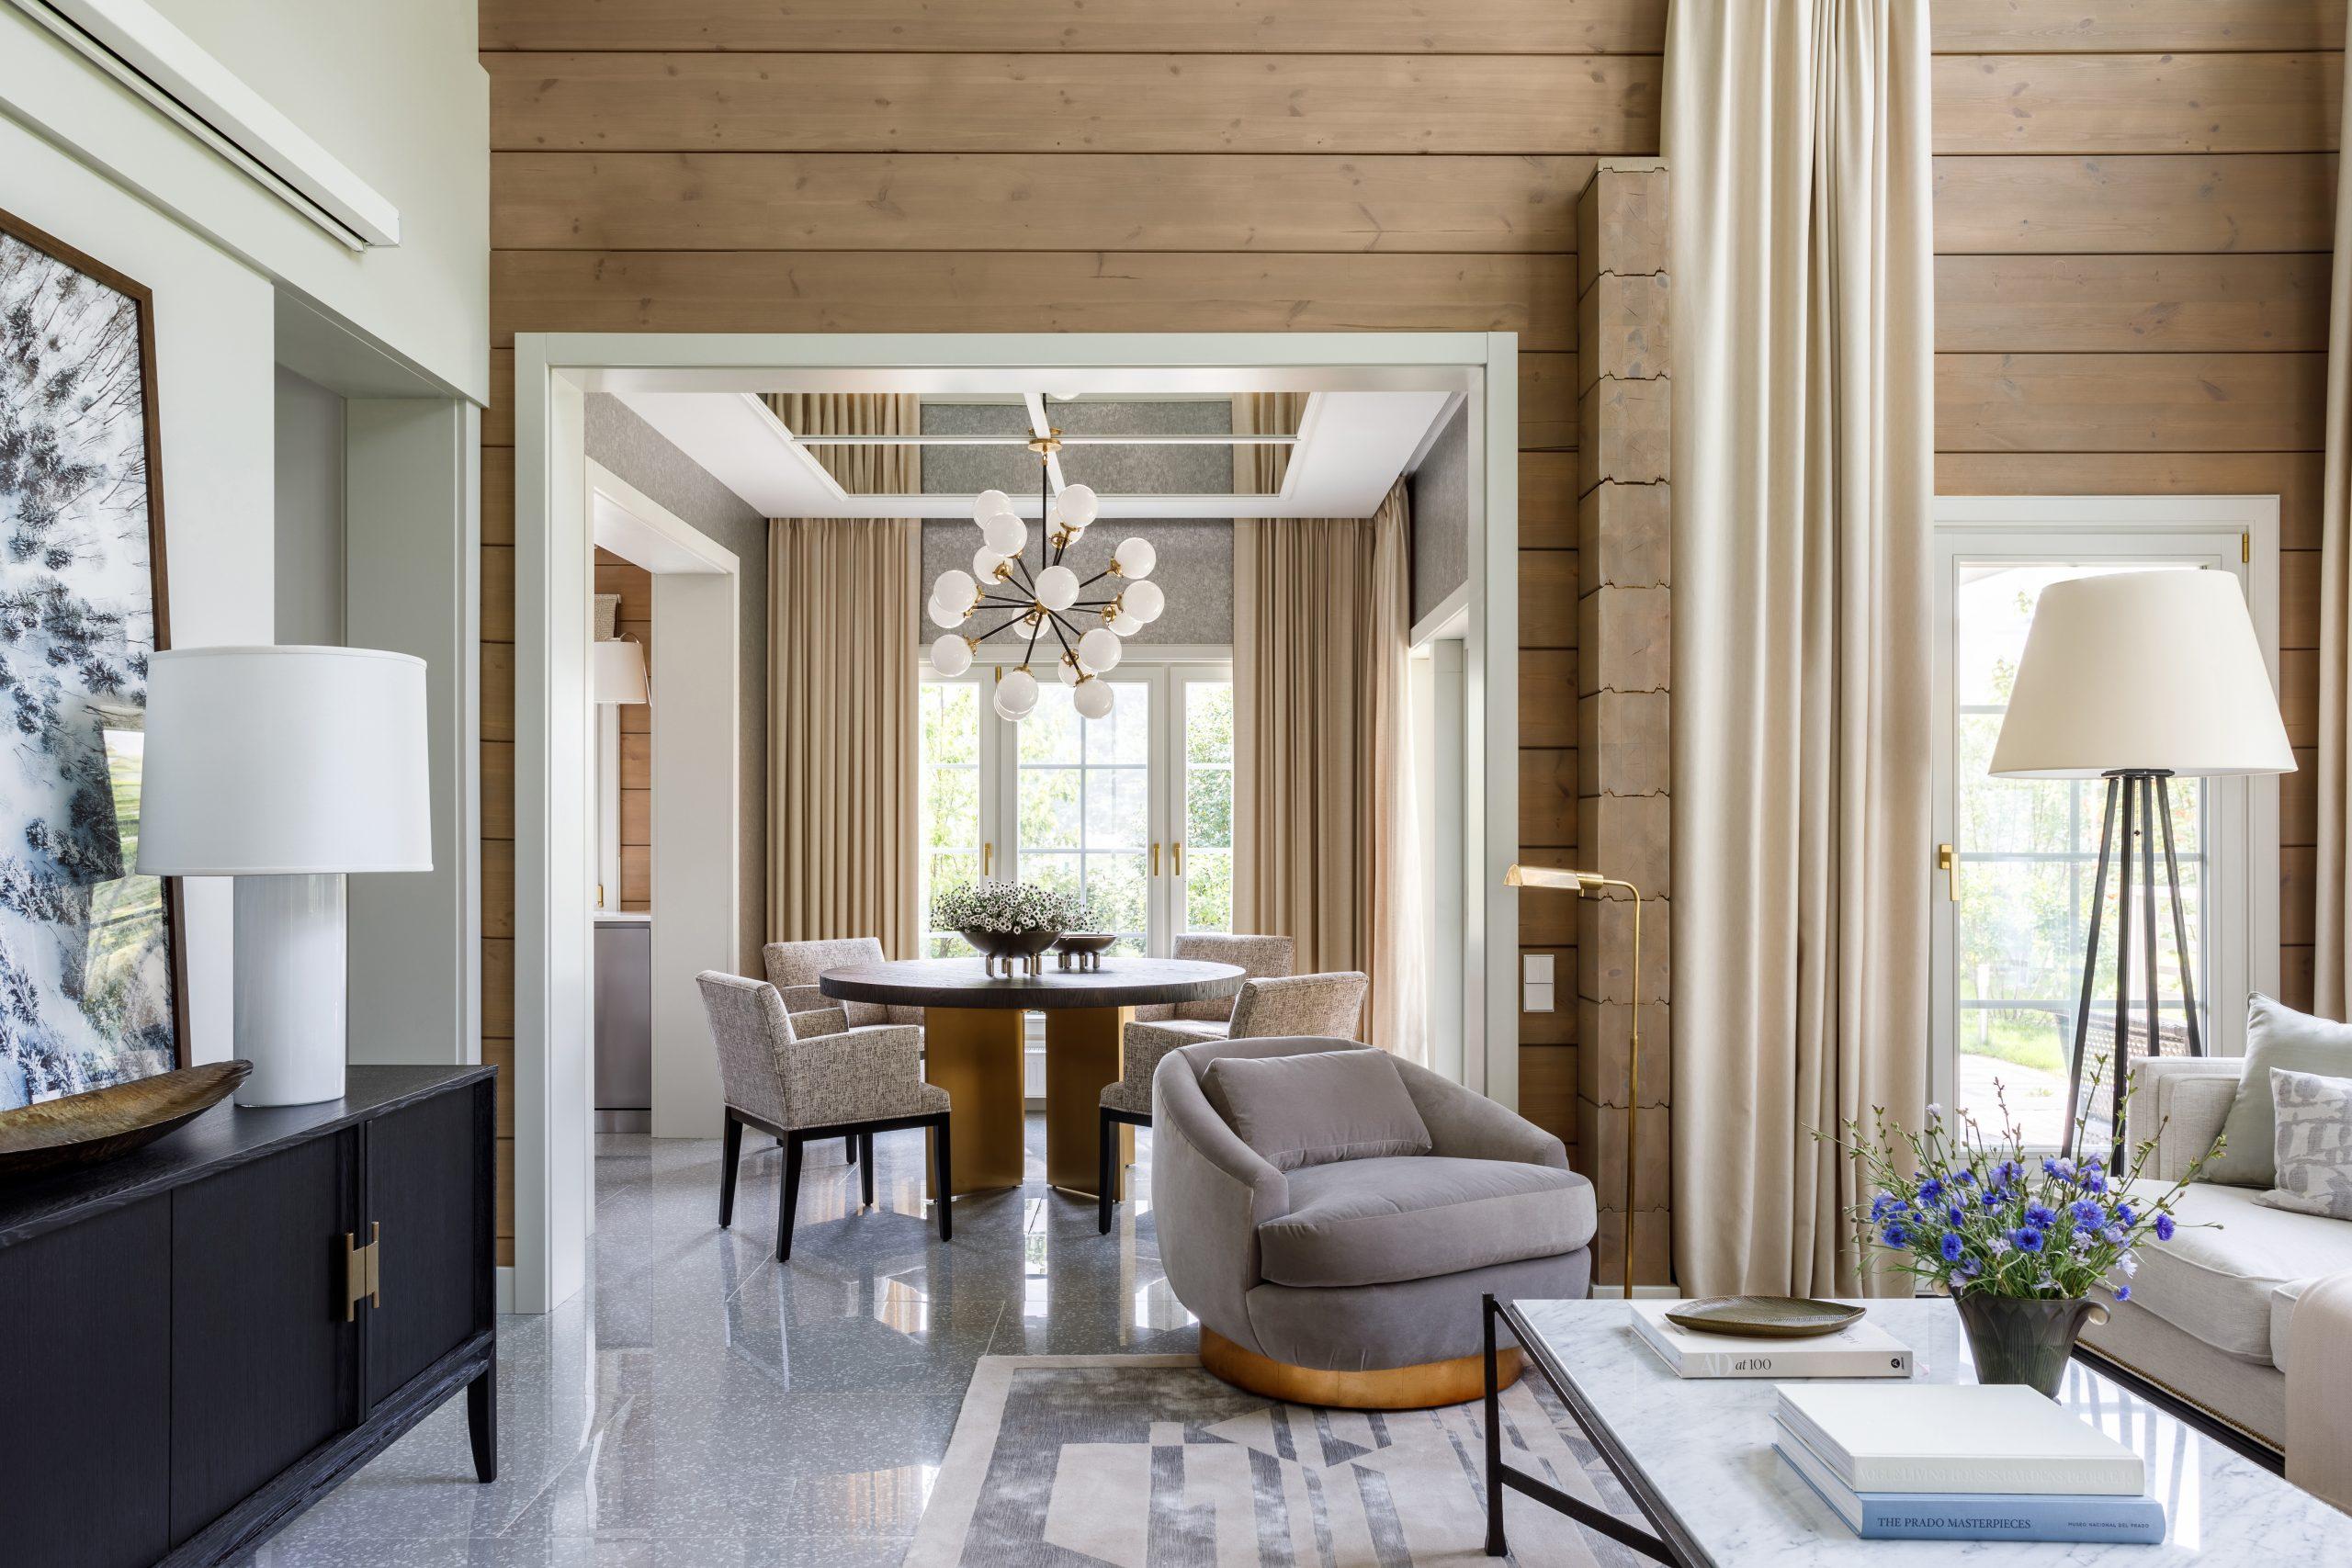 House in Moscow interior designed by Olga Malyeva